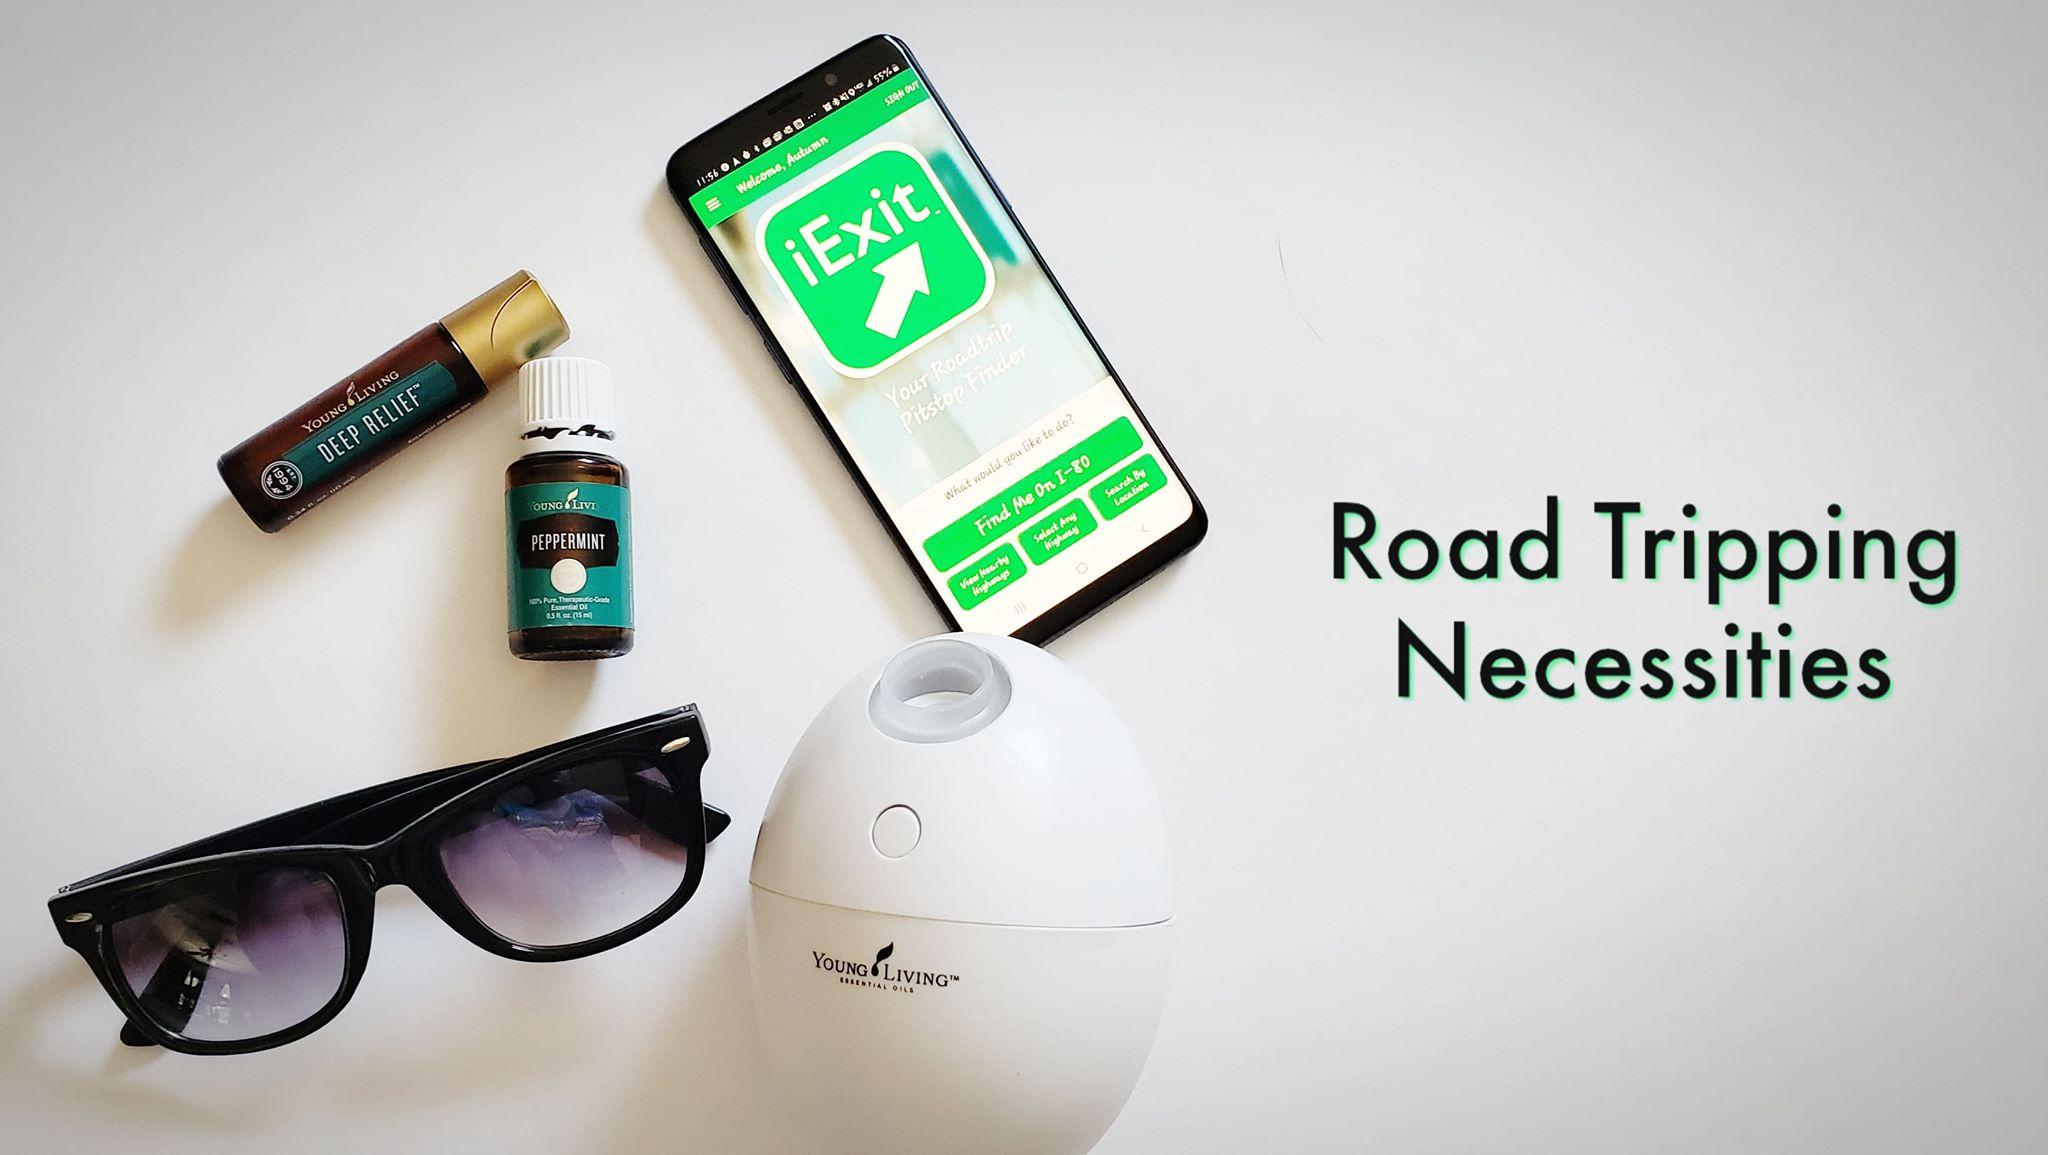 roadtripping necessities.jpg